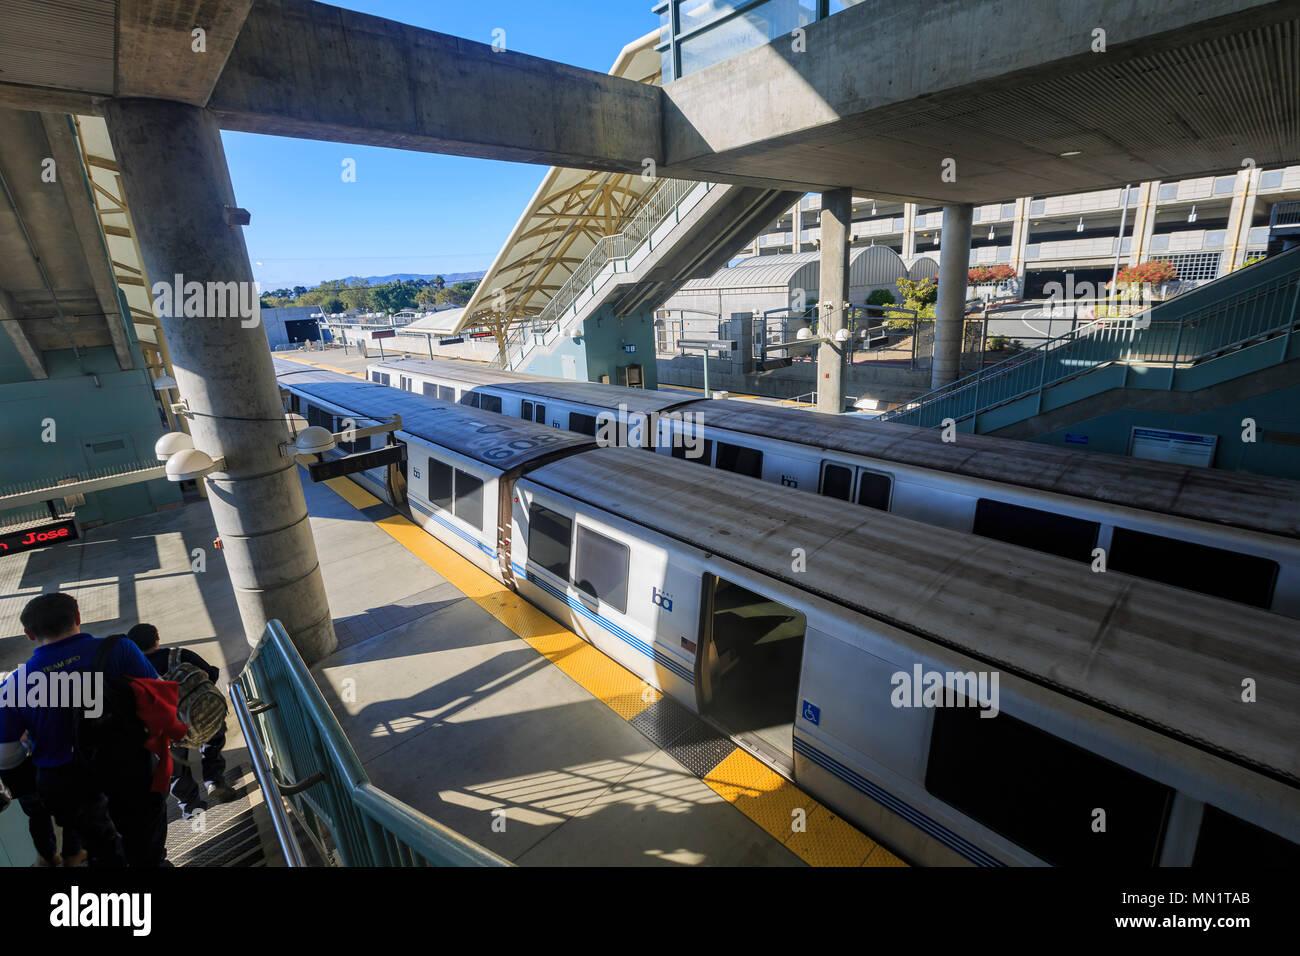 San Francisco, AUG 24: The Bay Area Rapid Transit on AUG 24, 2014 at San Francisco - Stock Image